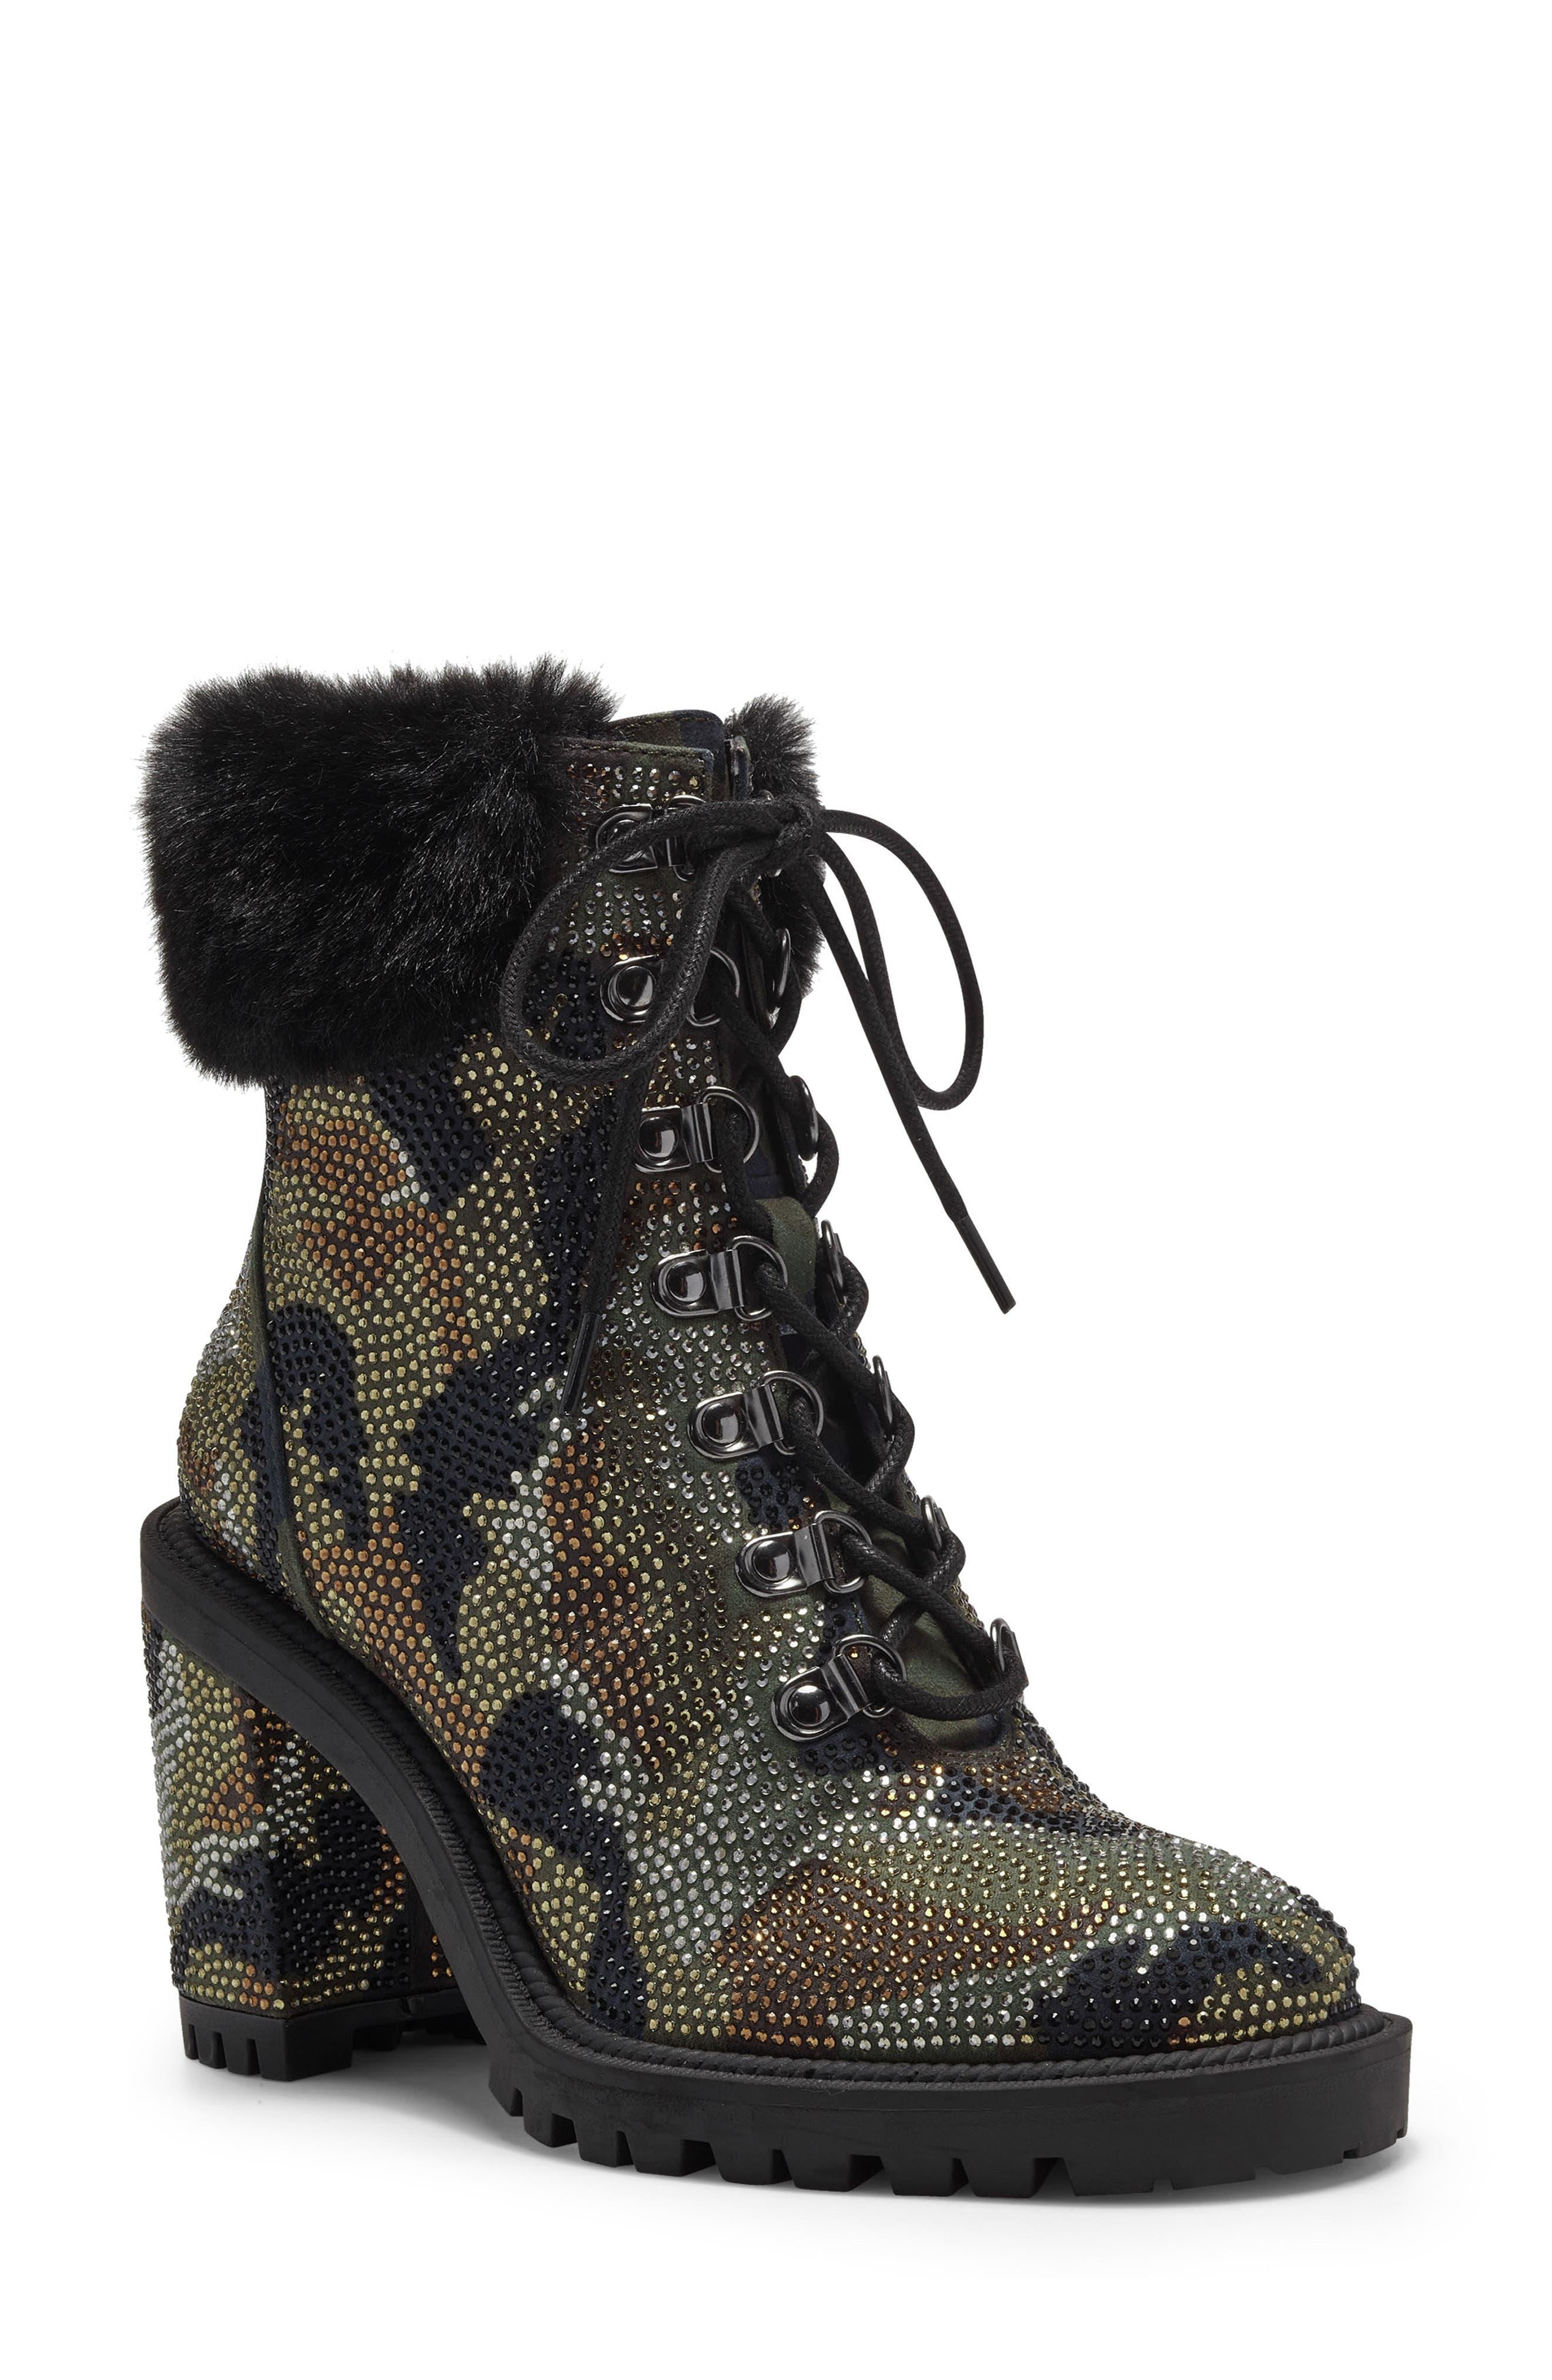 Deliah Studded Block Heel Bootie With Faux Fur Trim